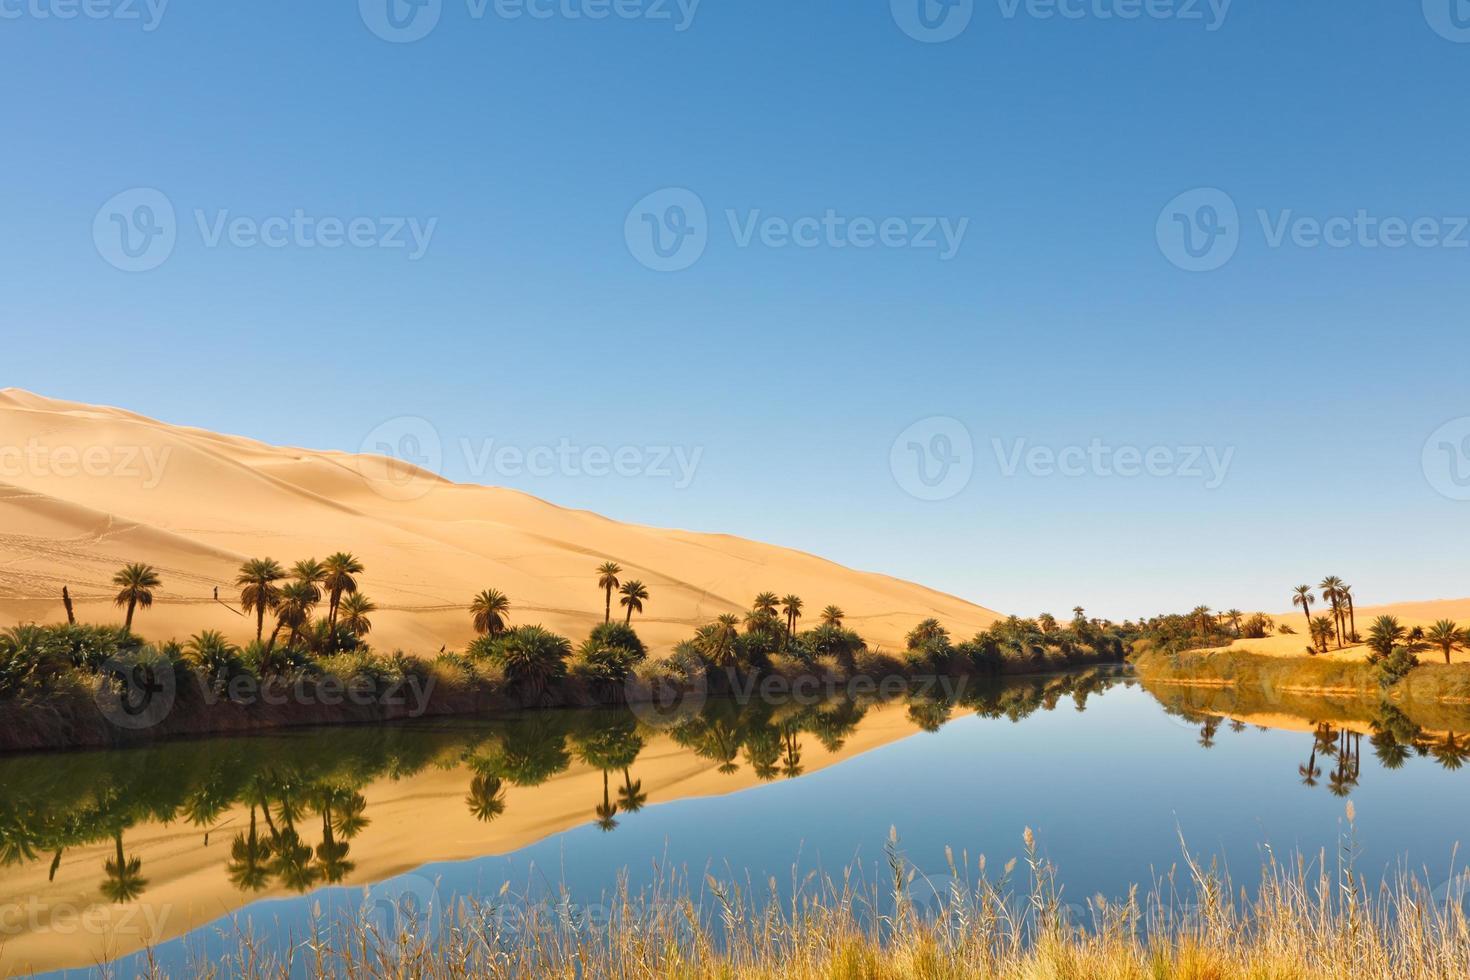 umm al-ma meer - woestijnoase, sahara, libië foto